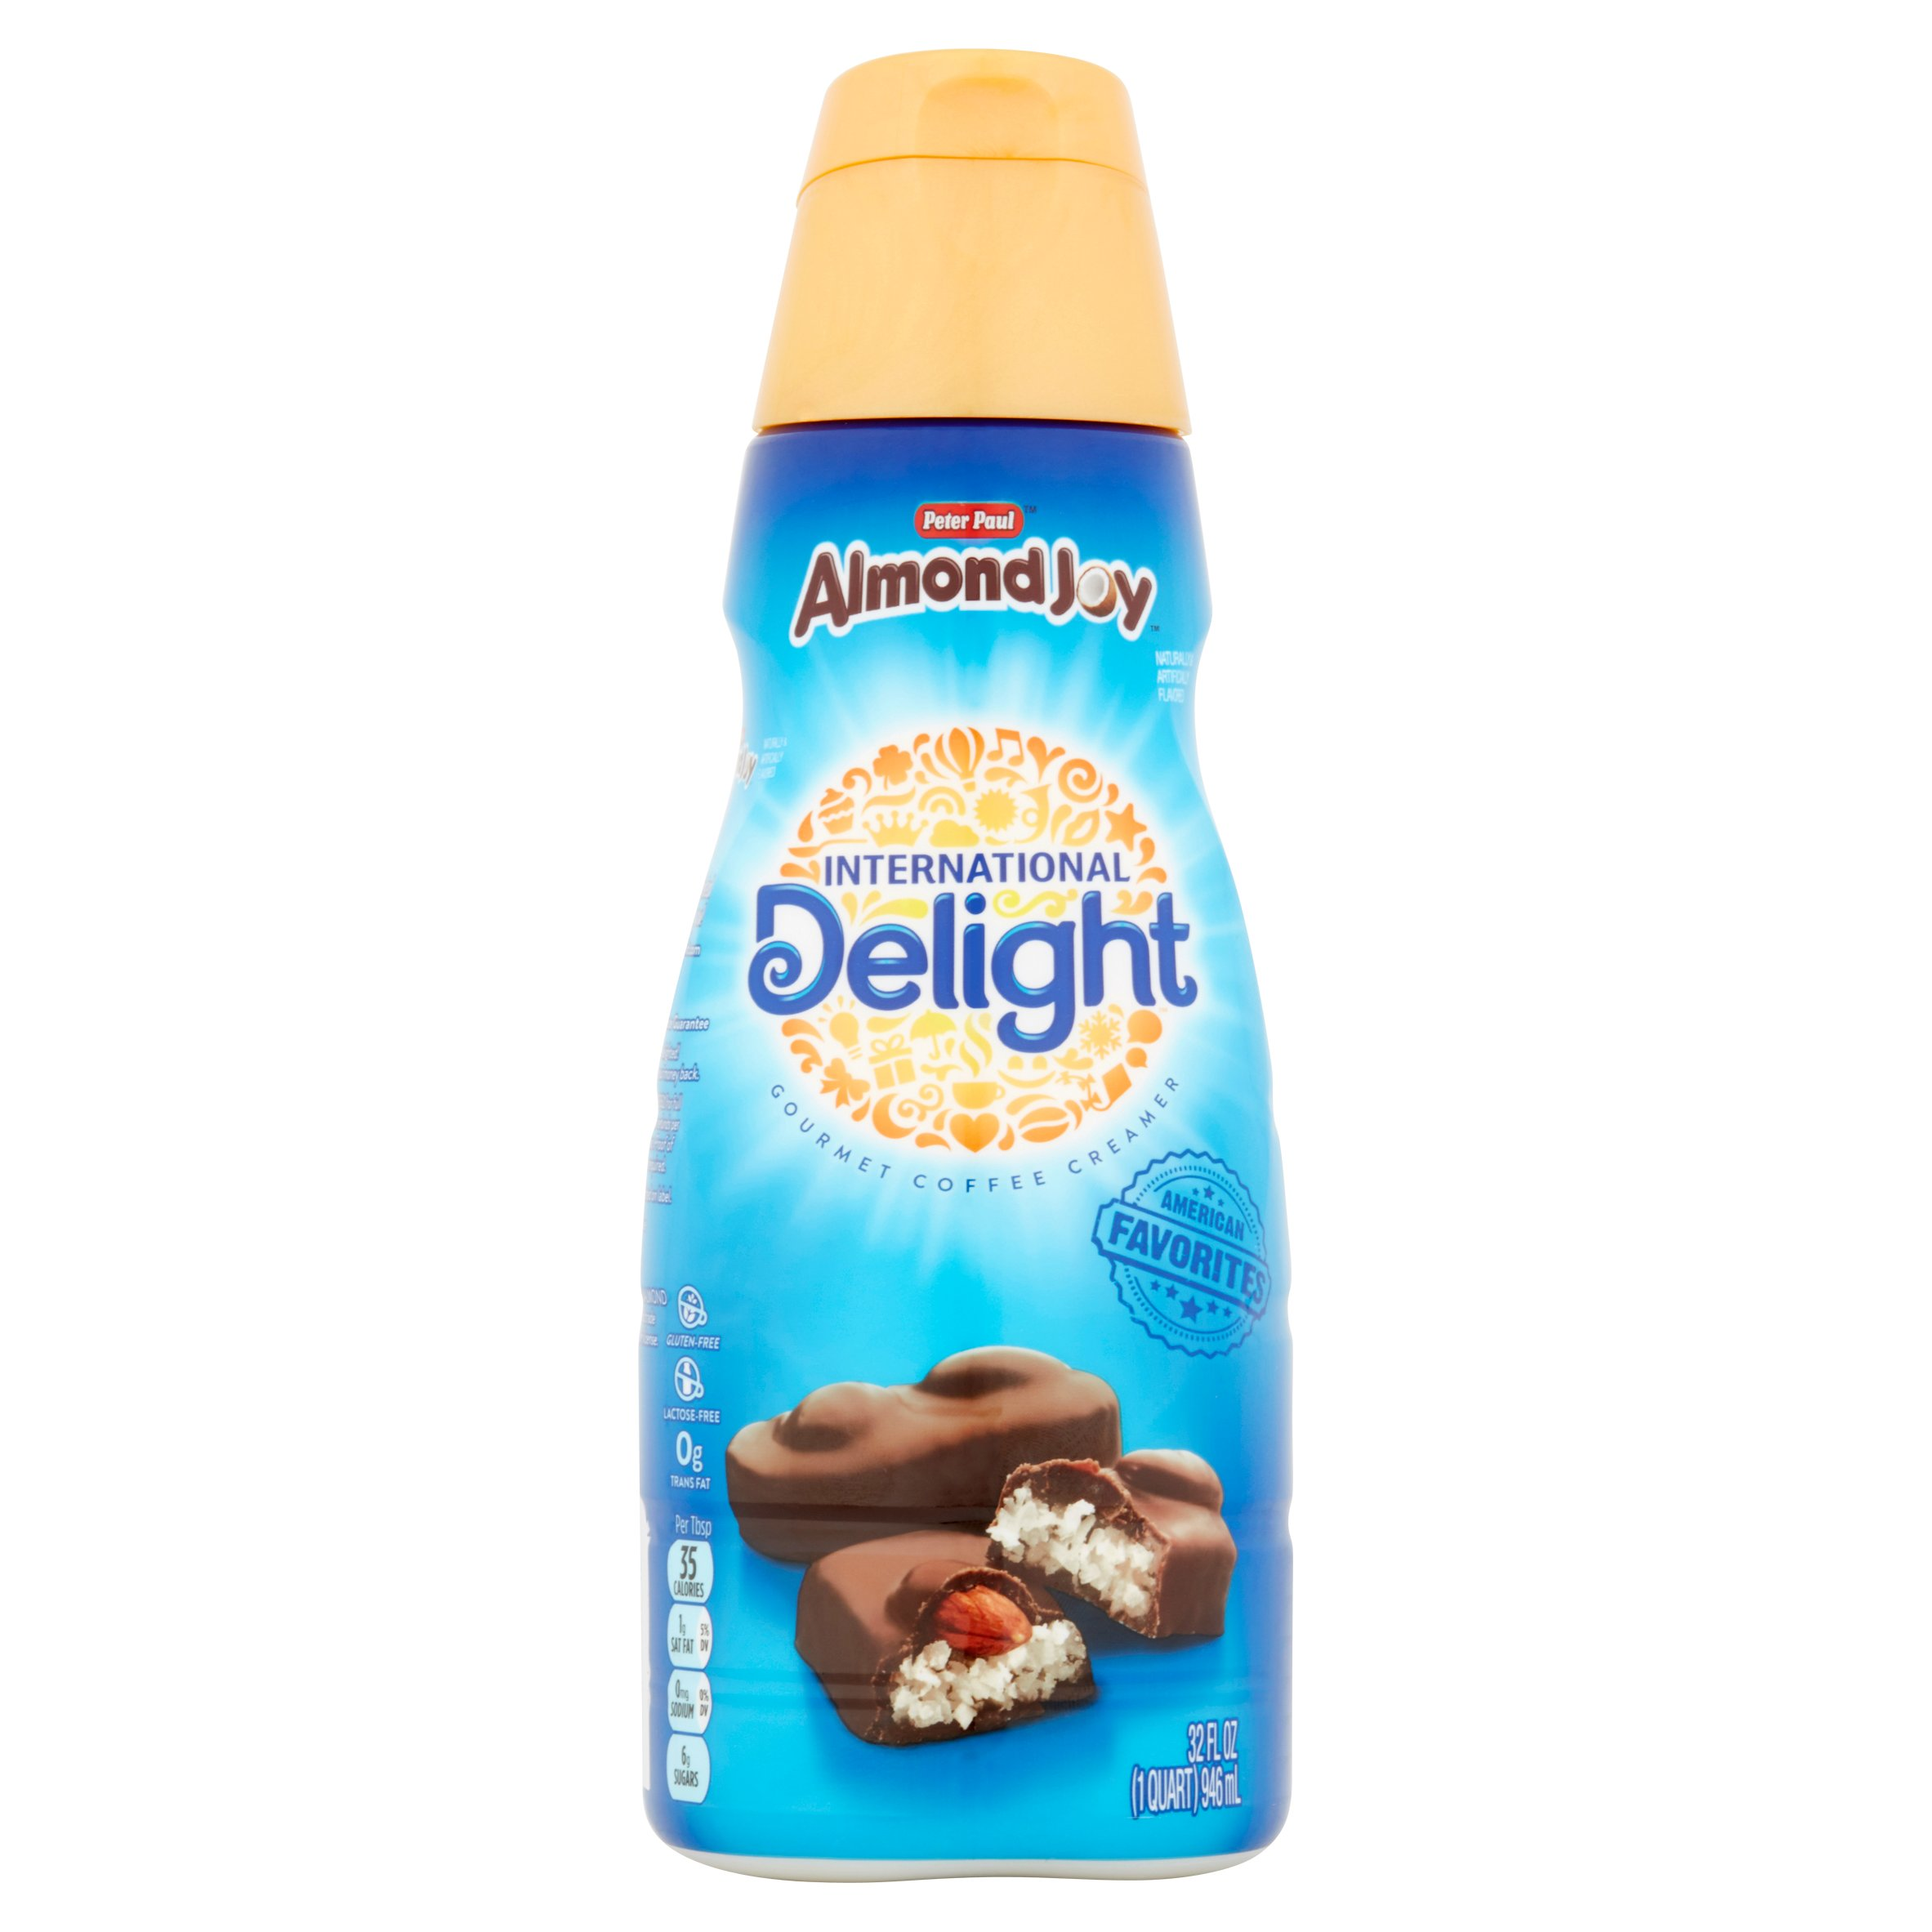 International Delight, Almond Joy Coffee Creamer, 32 Oz. - Walmart.com